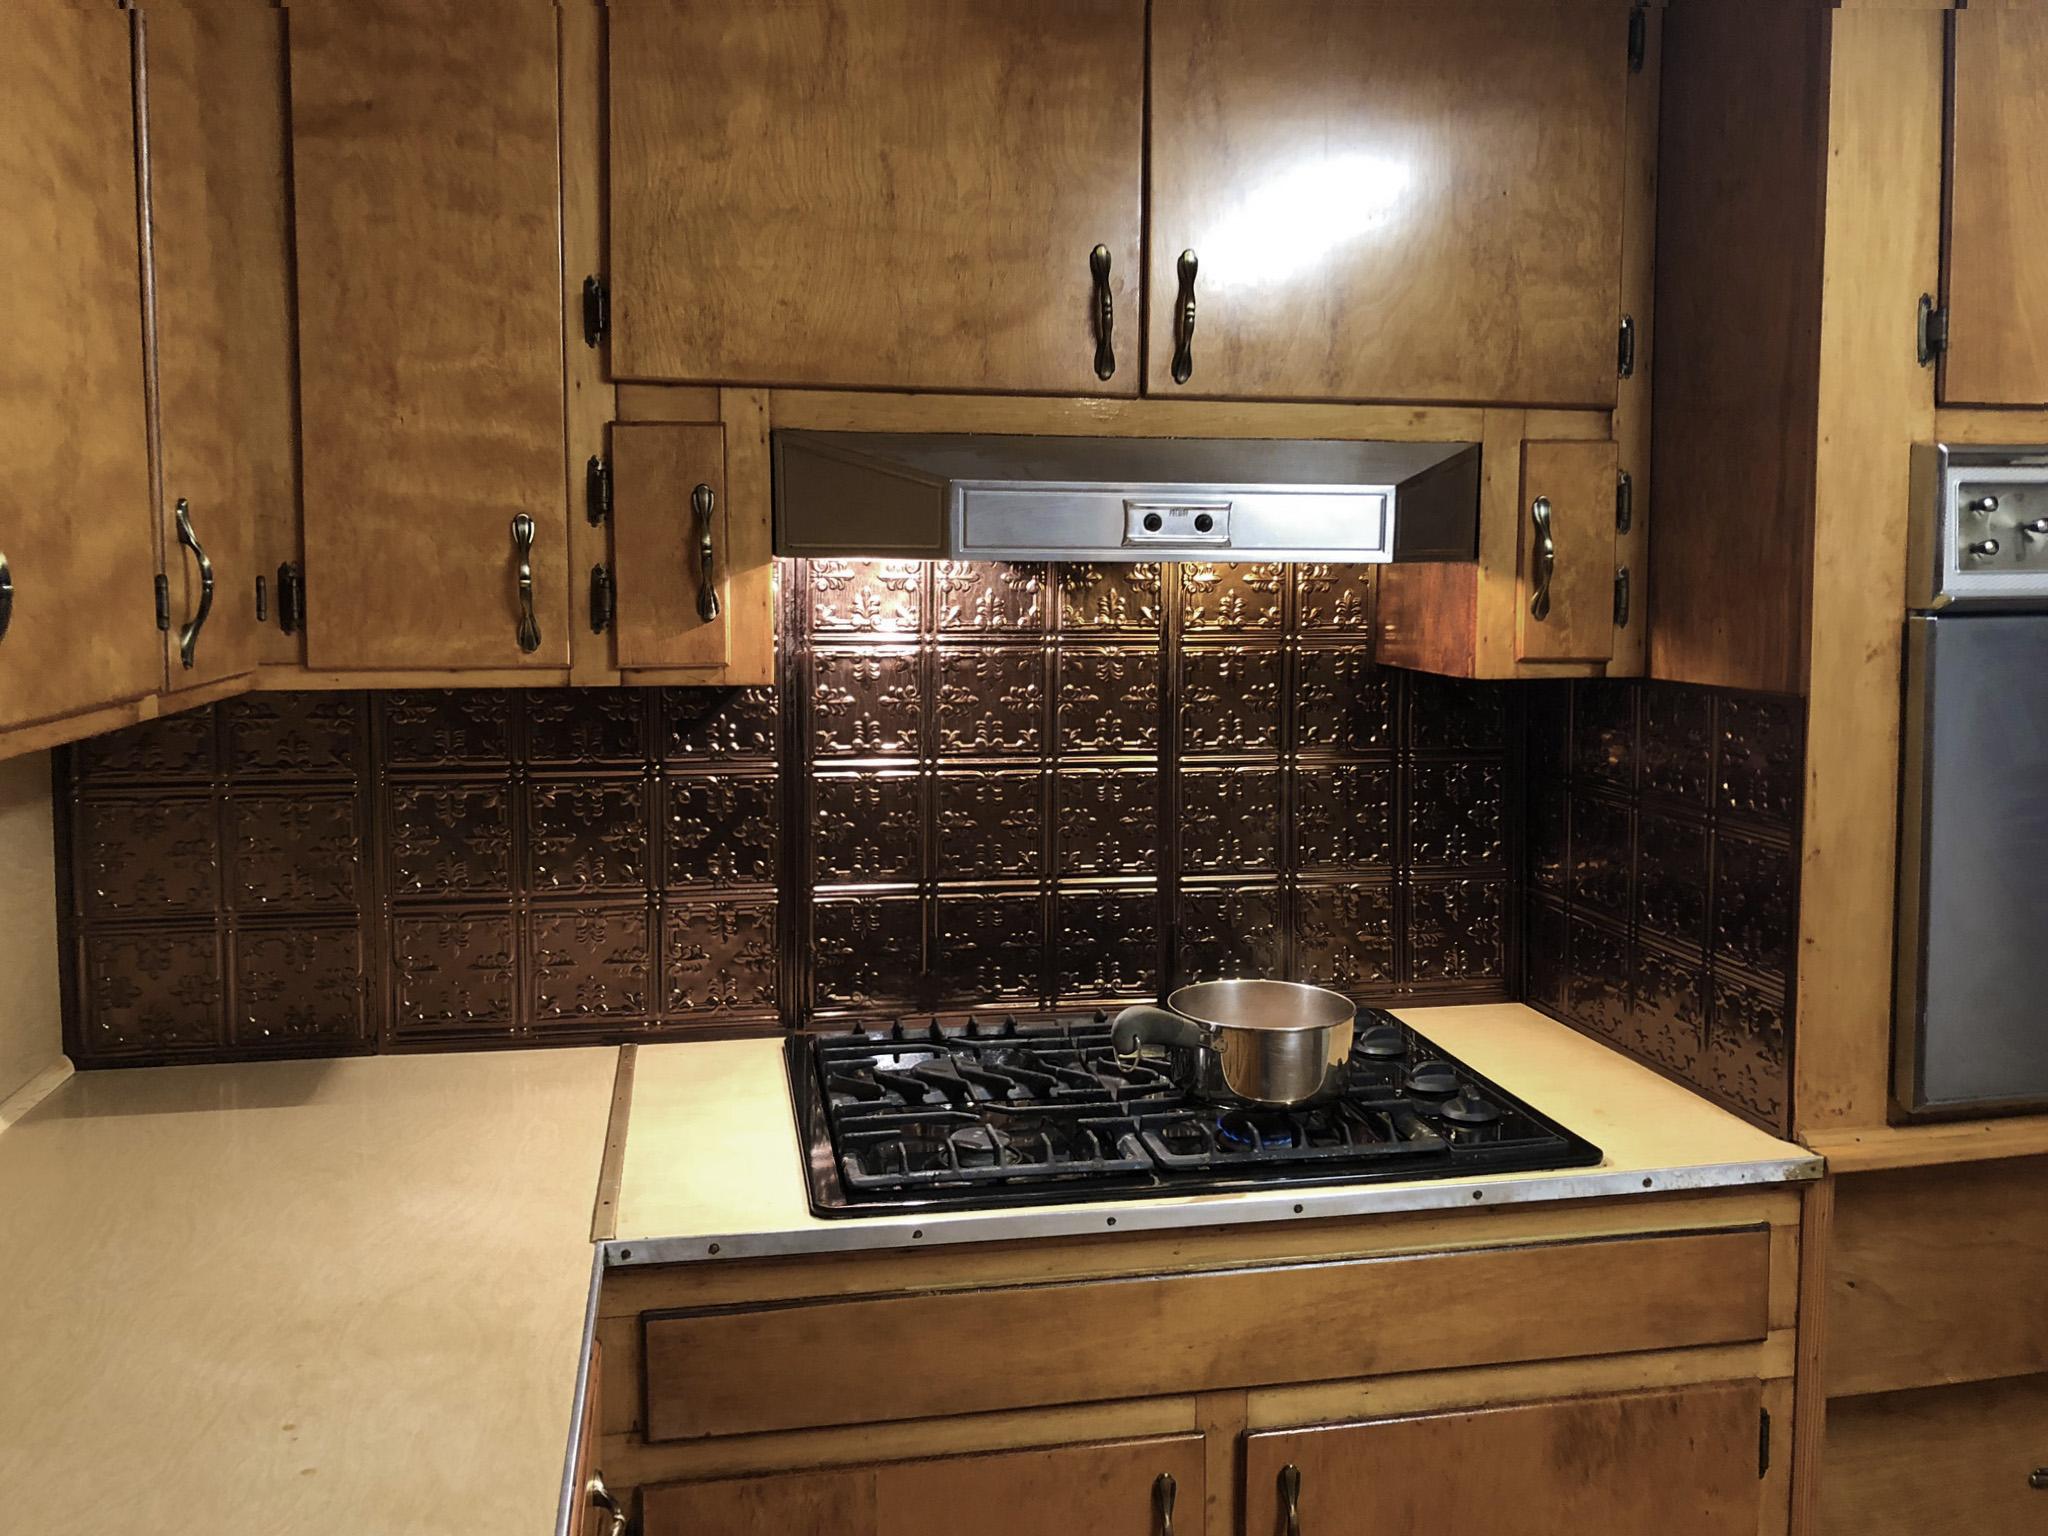 kitchen stove closeup